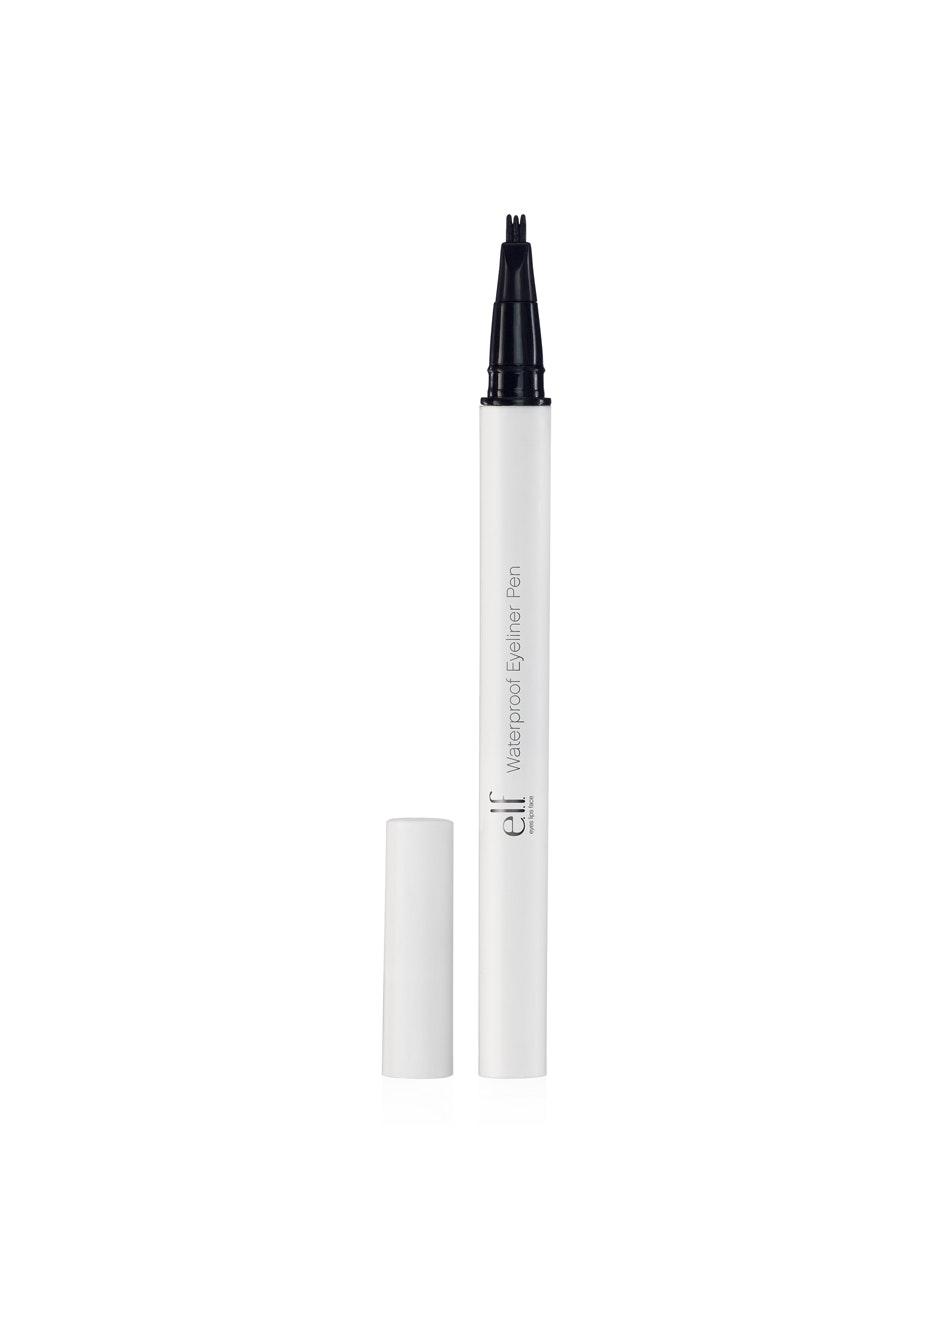 e.l.f Esse0N Waterproof Eyeliner Pen 21651